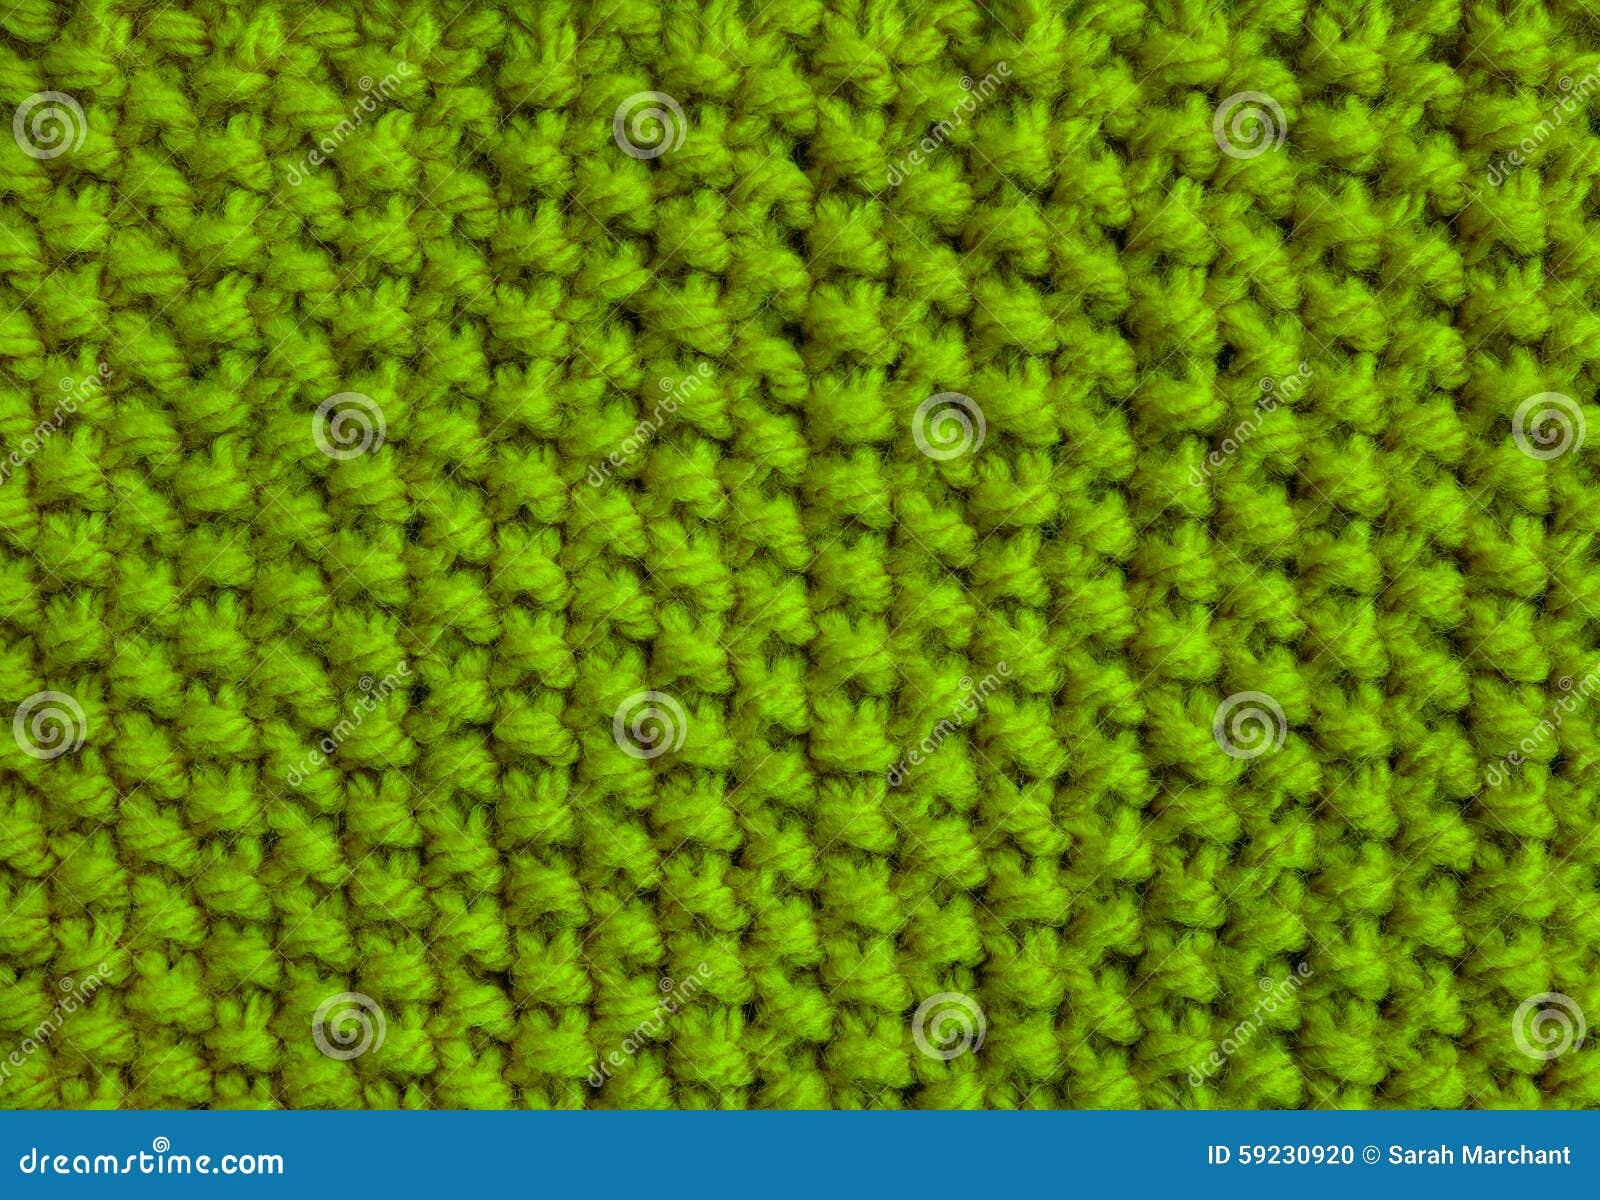 Moss Stitch Knitting In Green Wool Stock Photo - Image of